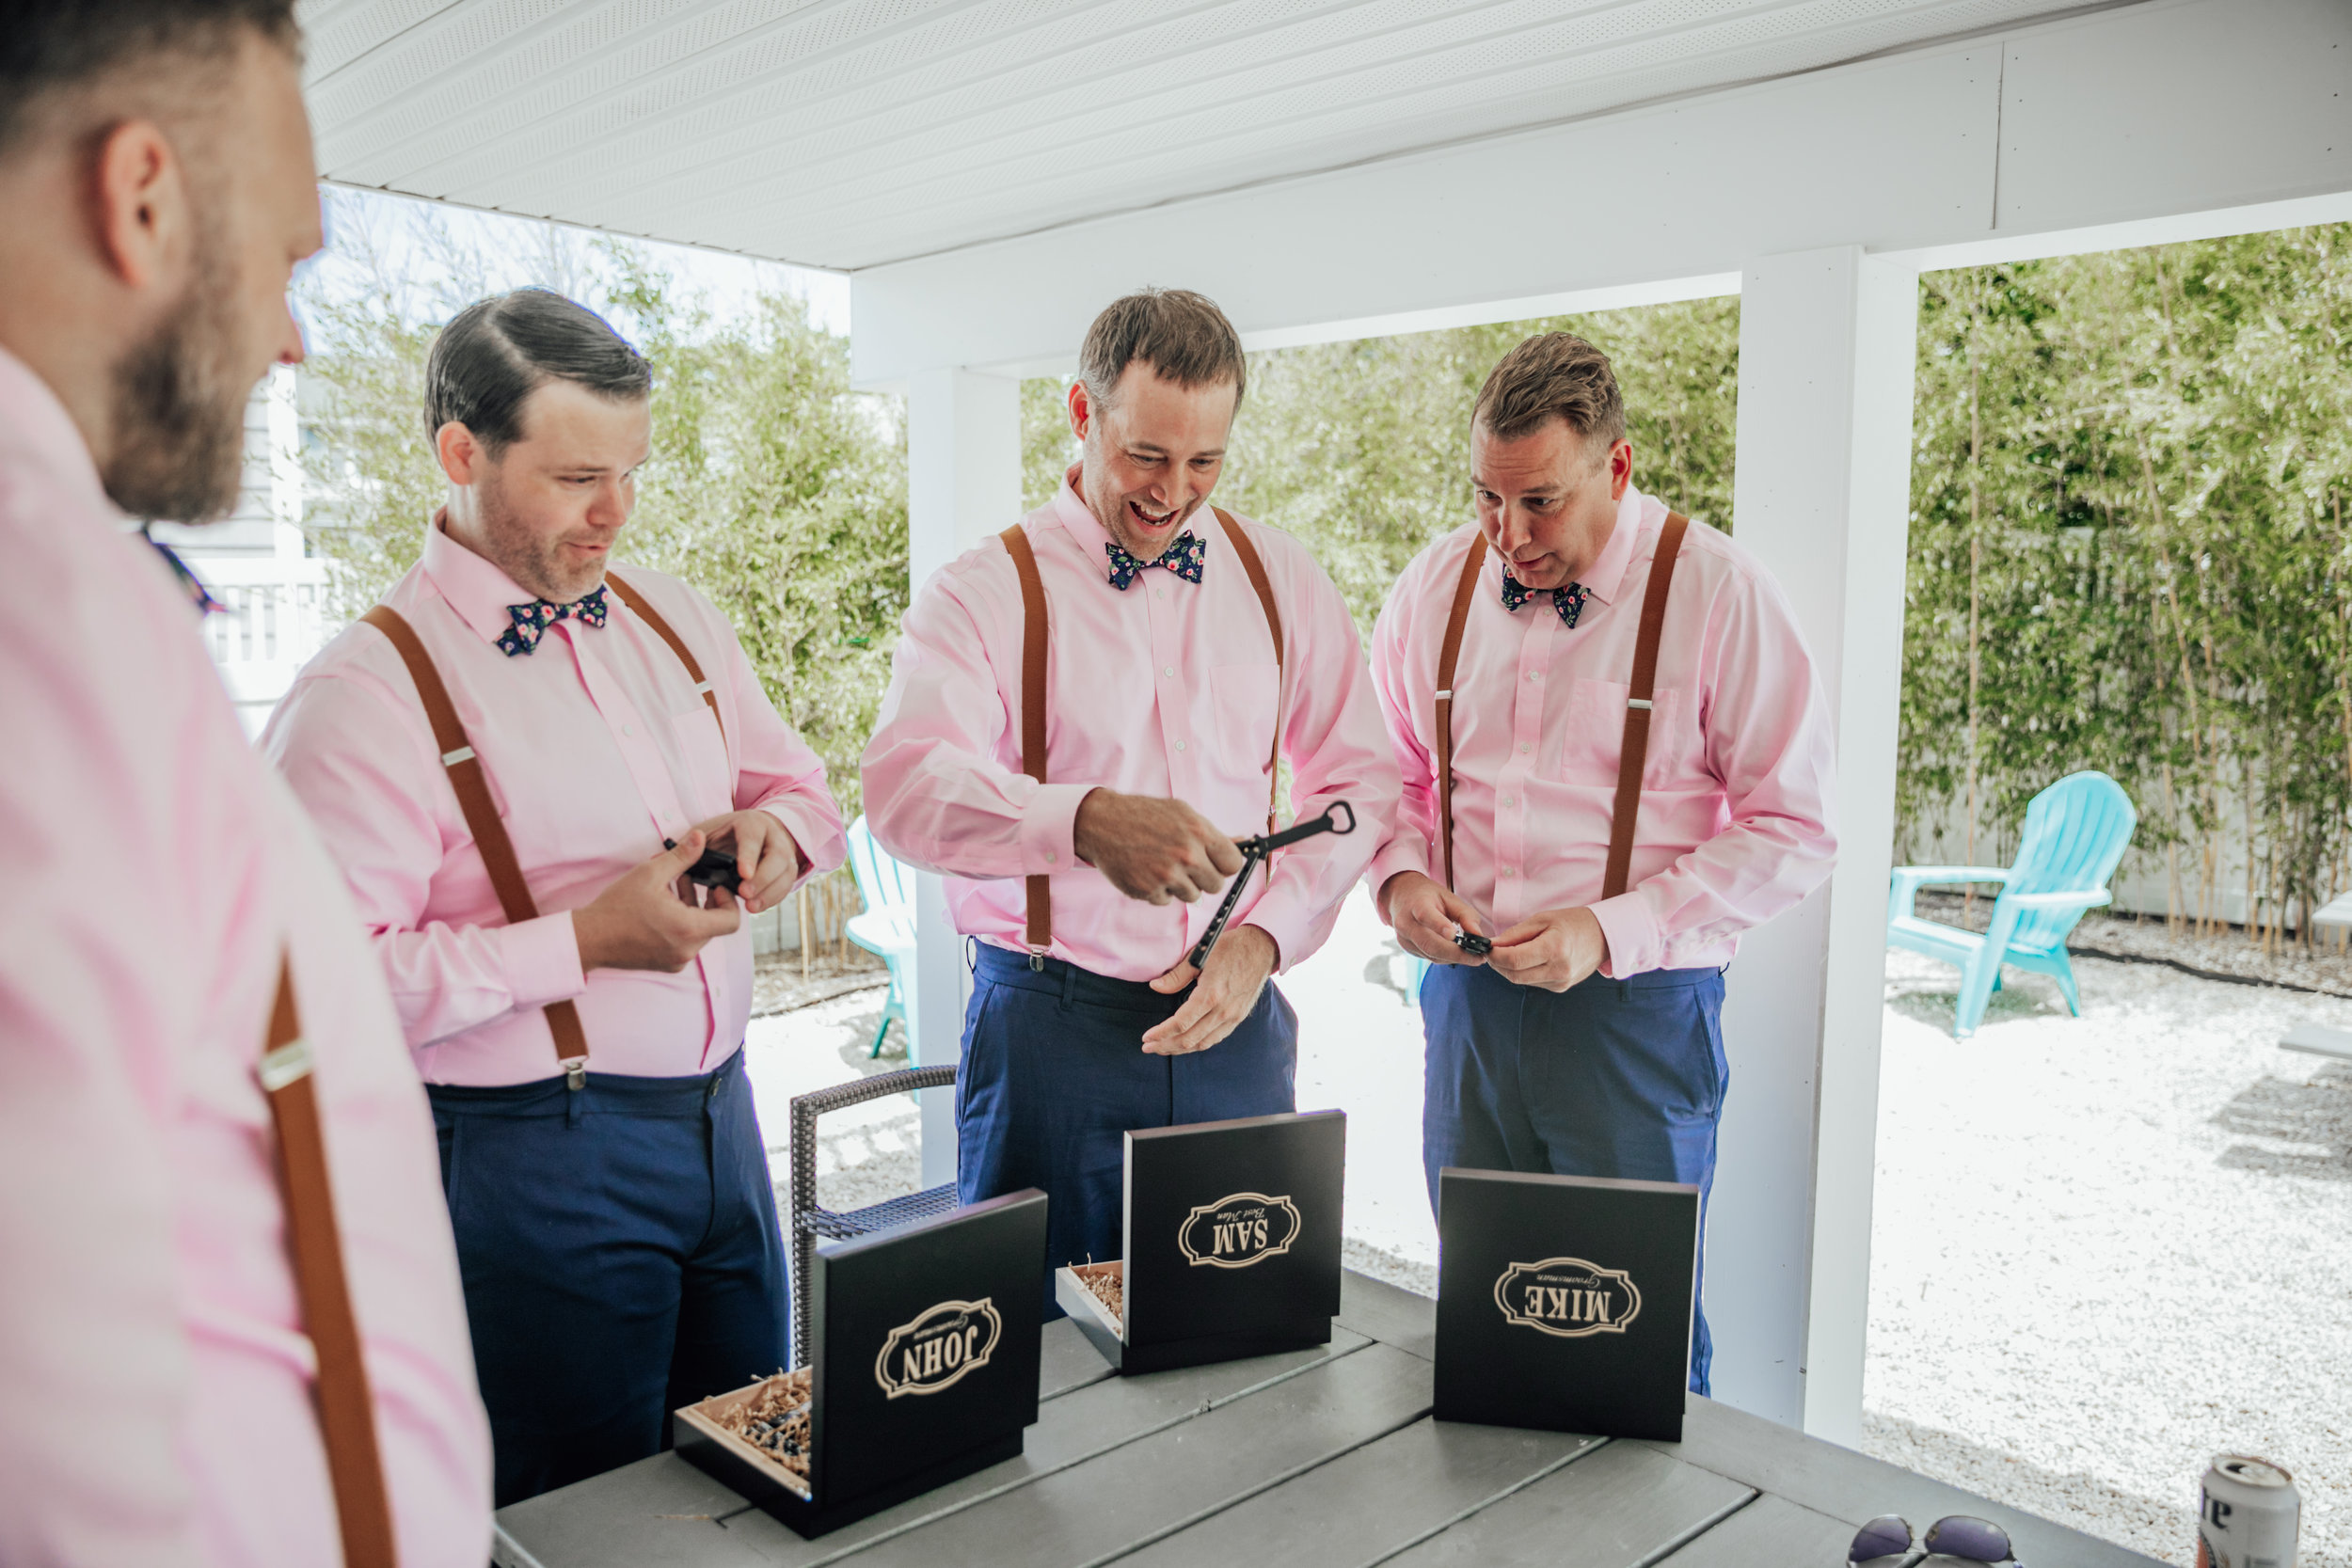 New Jersey Wedding Photographer, Felsberg Photography LBI wedding photography 46.jpg